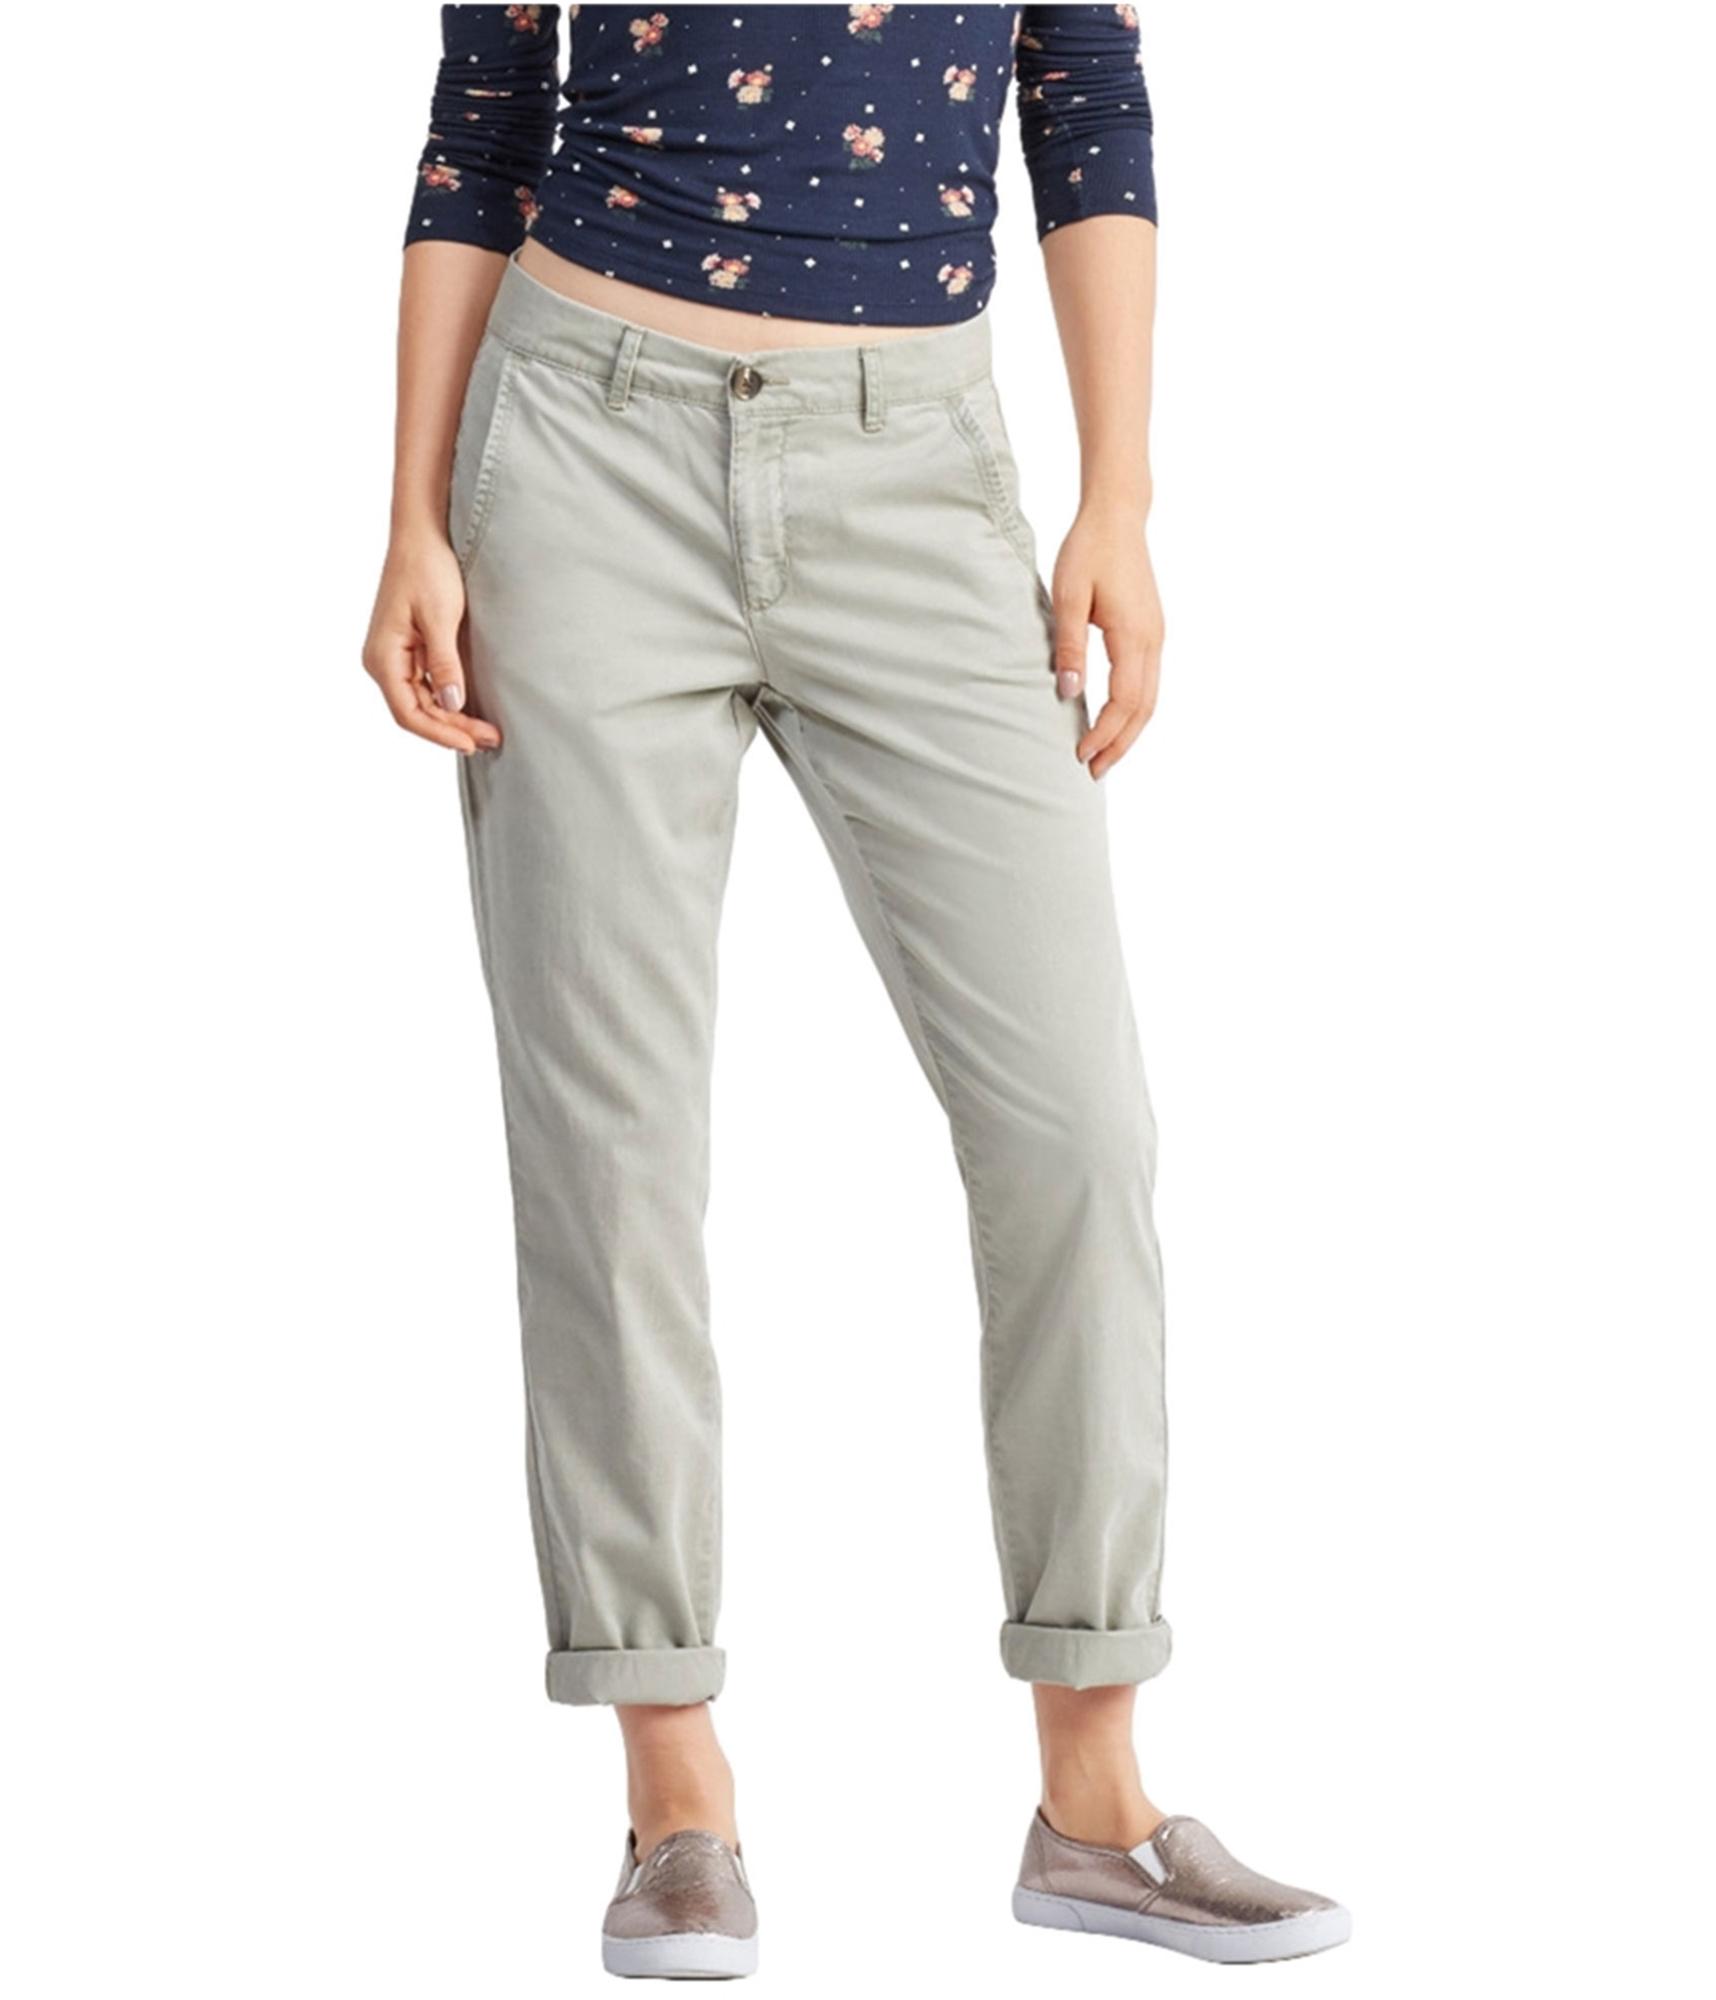 Aeropostale Mujer Chino Informal Pantalones Verde 2 Ebay